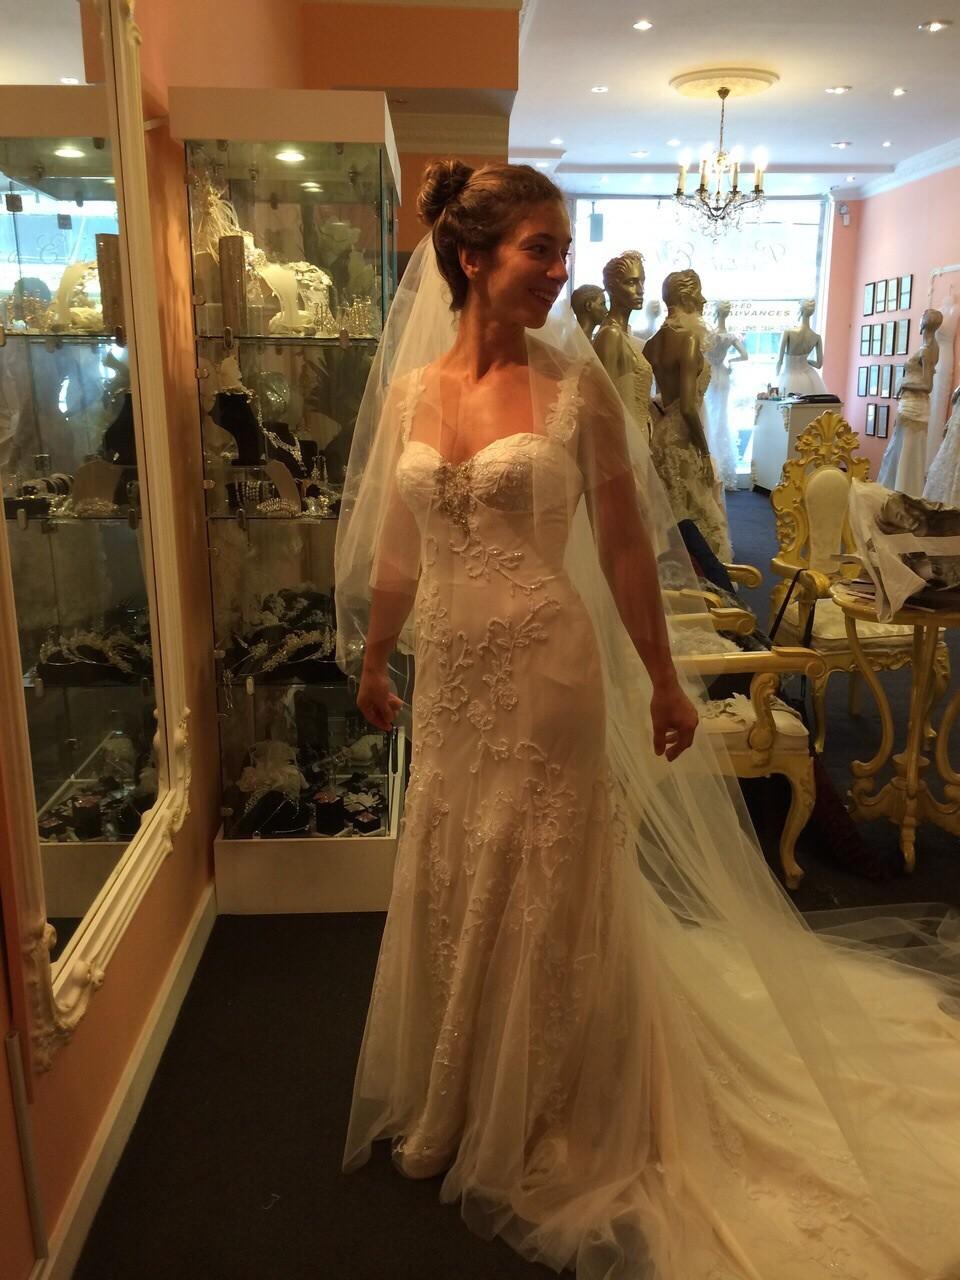 Lora eliss cleo second hand wedding dress on sale 56 off for Second hand wedding dresses san diego